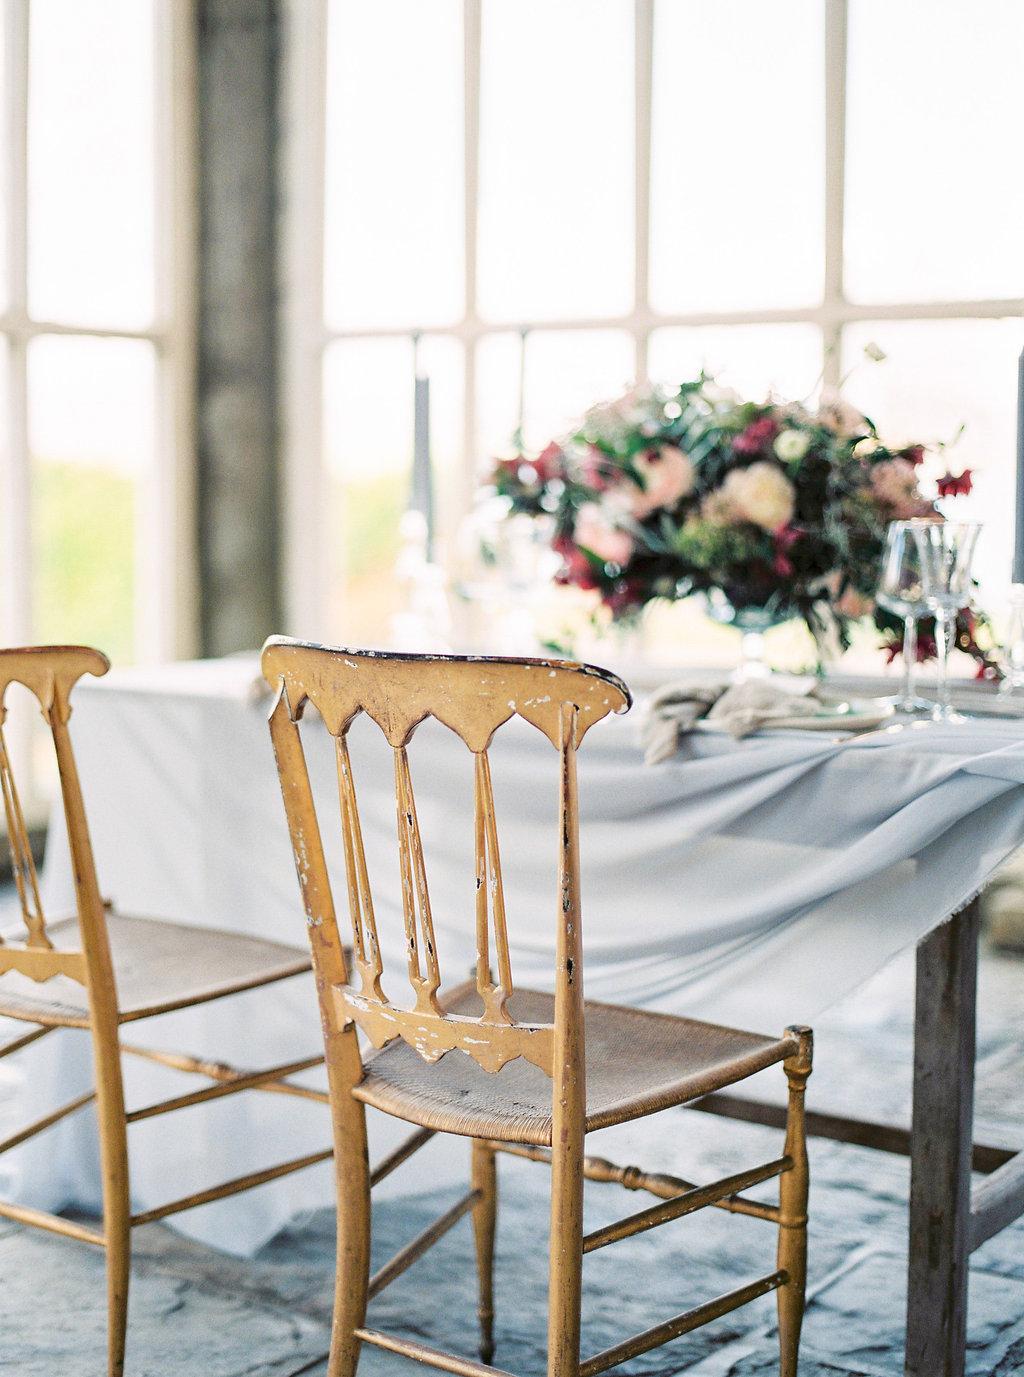 WeddingSparrow-PhotographybyIntoTheLight-Macias-lordan.com-ONLINESHARING(7of50).jpg